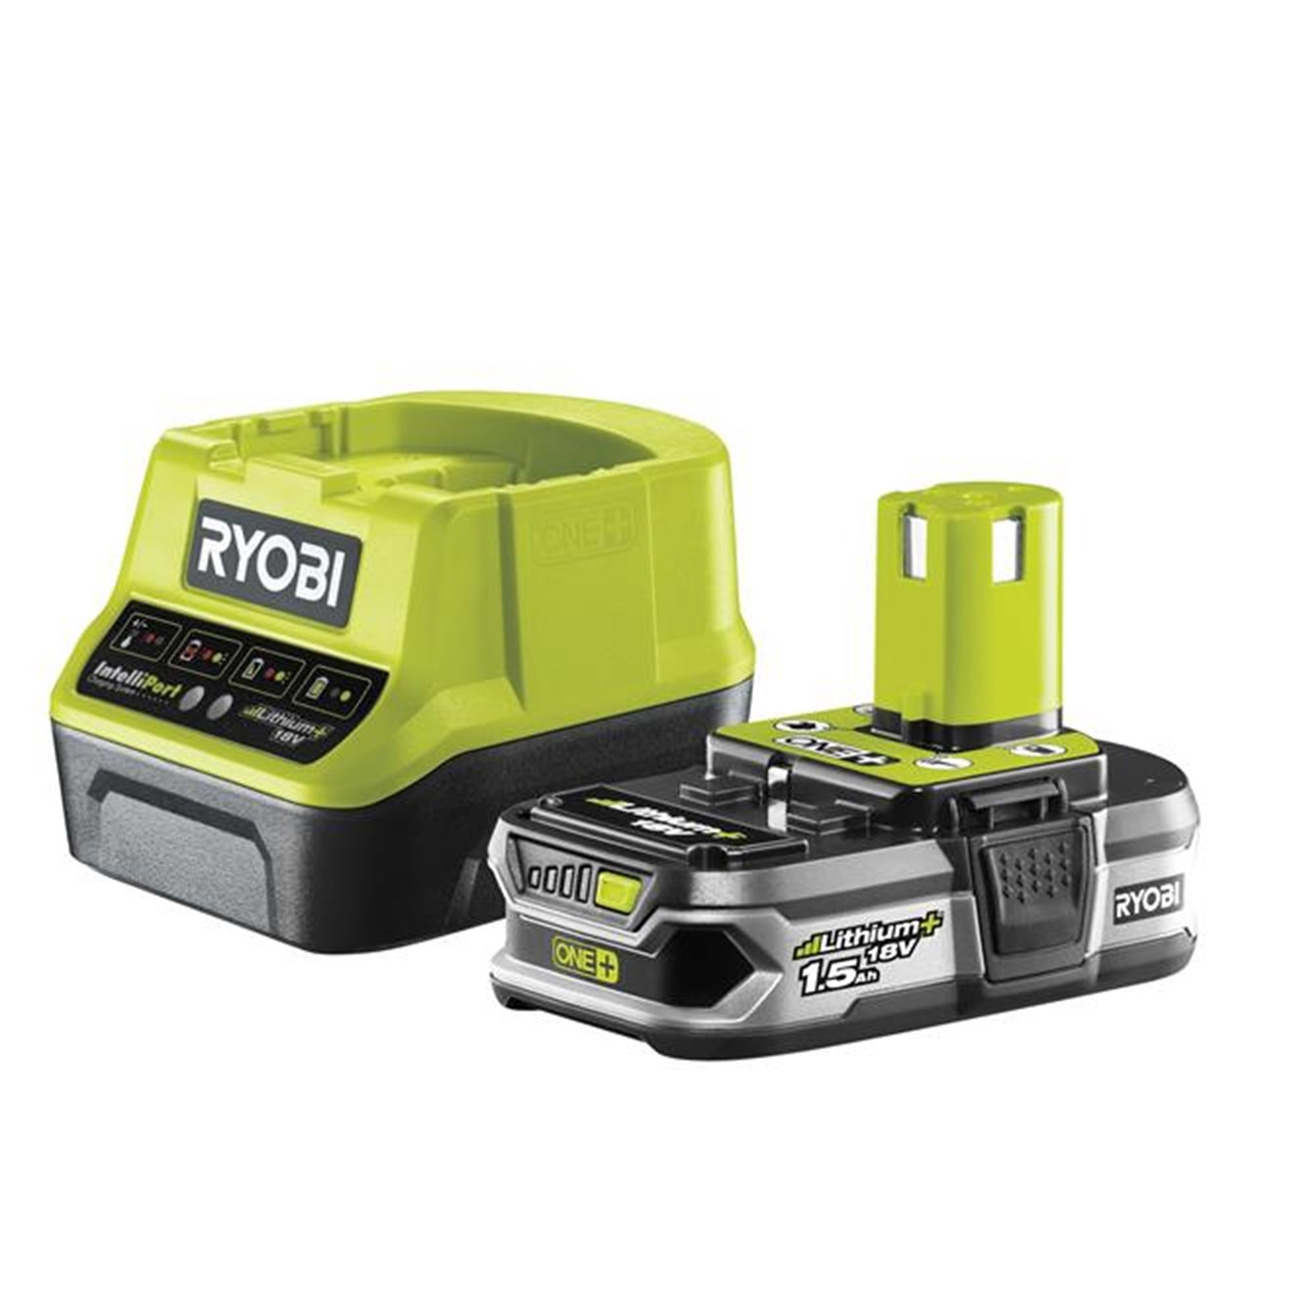 Kit Batteries et Chargeus Ryobi RC18120-115 18V